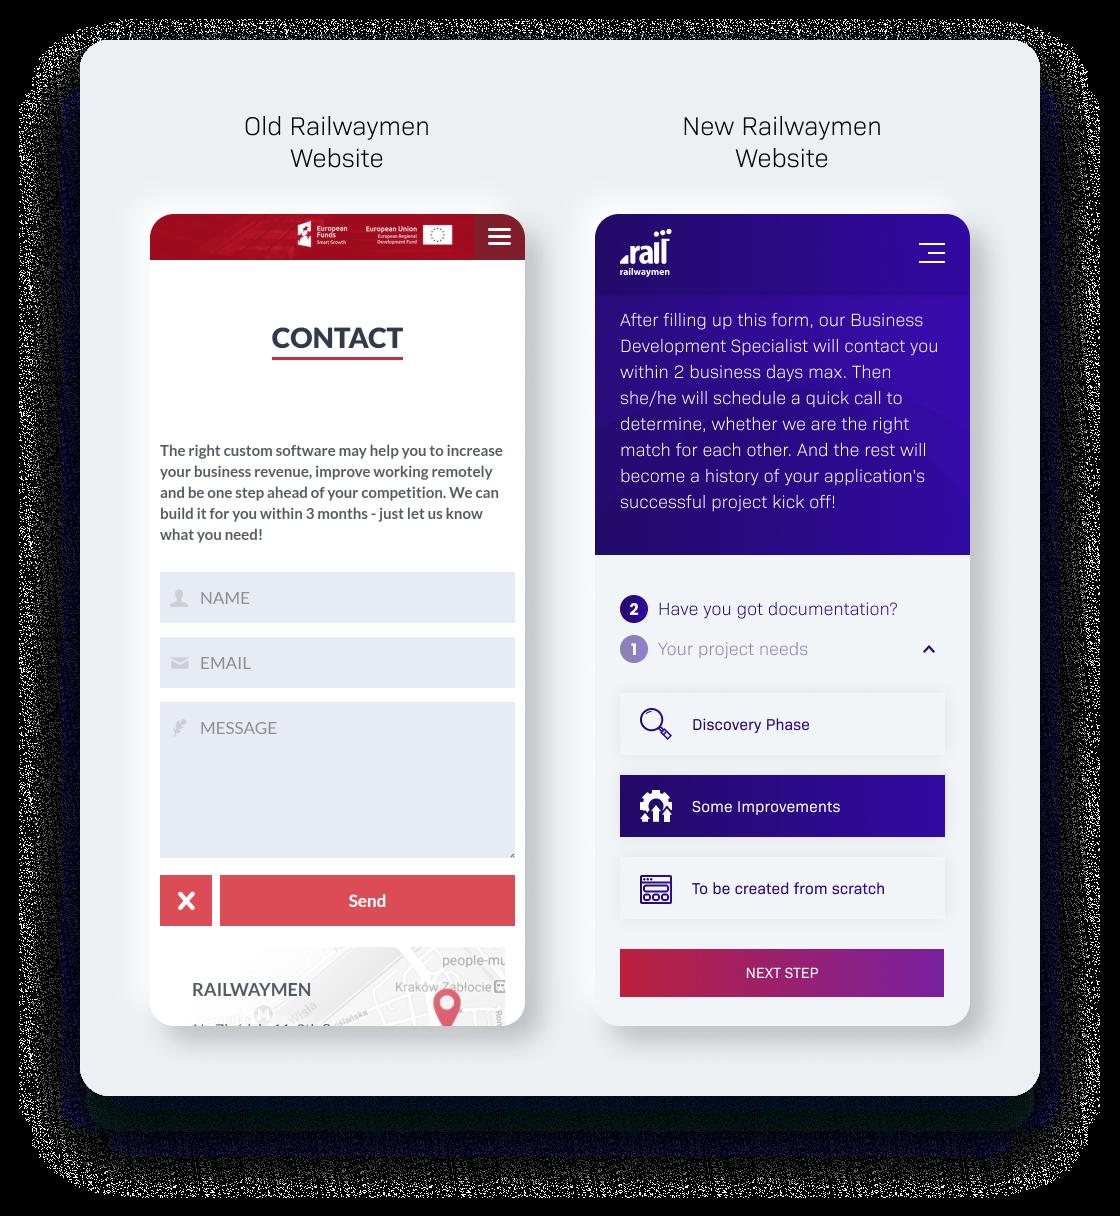 Railwaymen mobile contact form